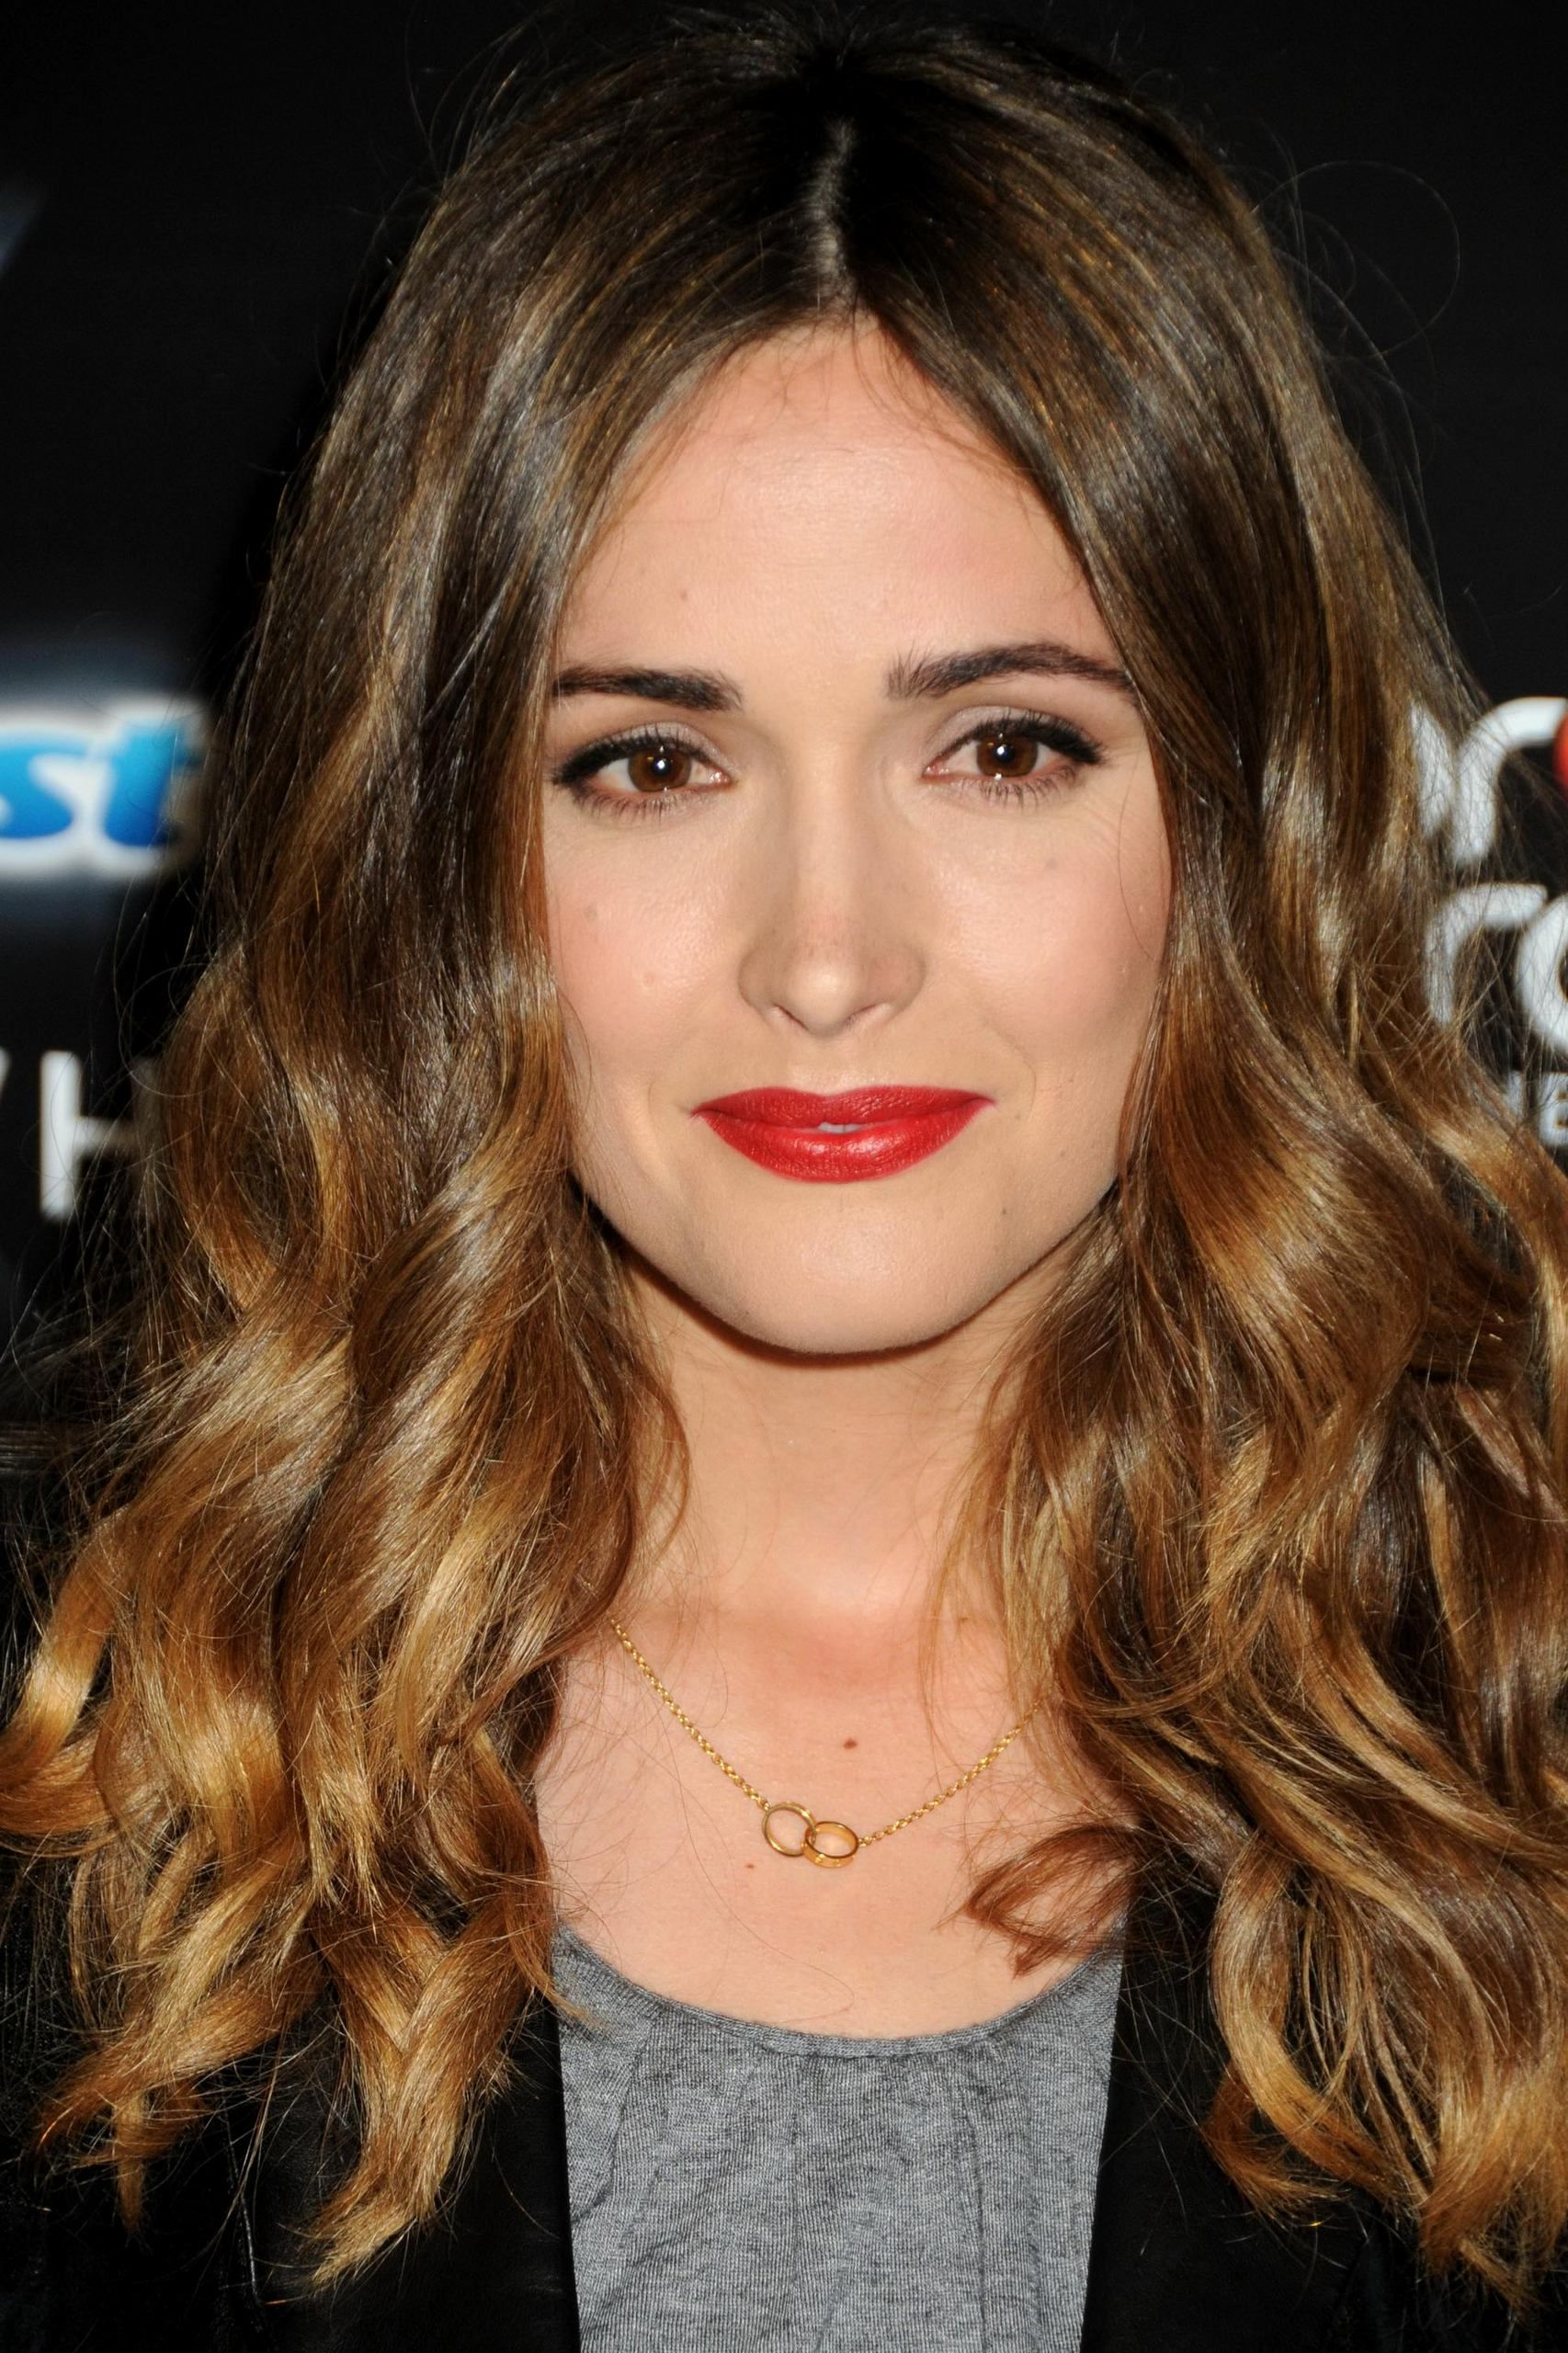 Look - Hair celebrity stylish alejandra a tfs exclusive video